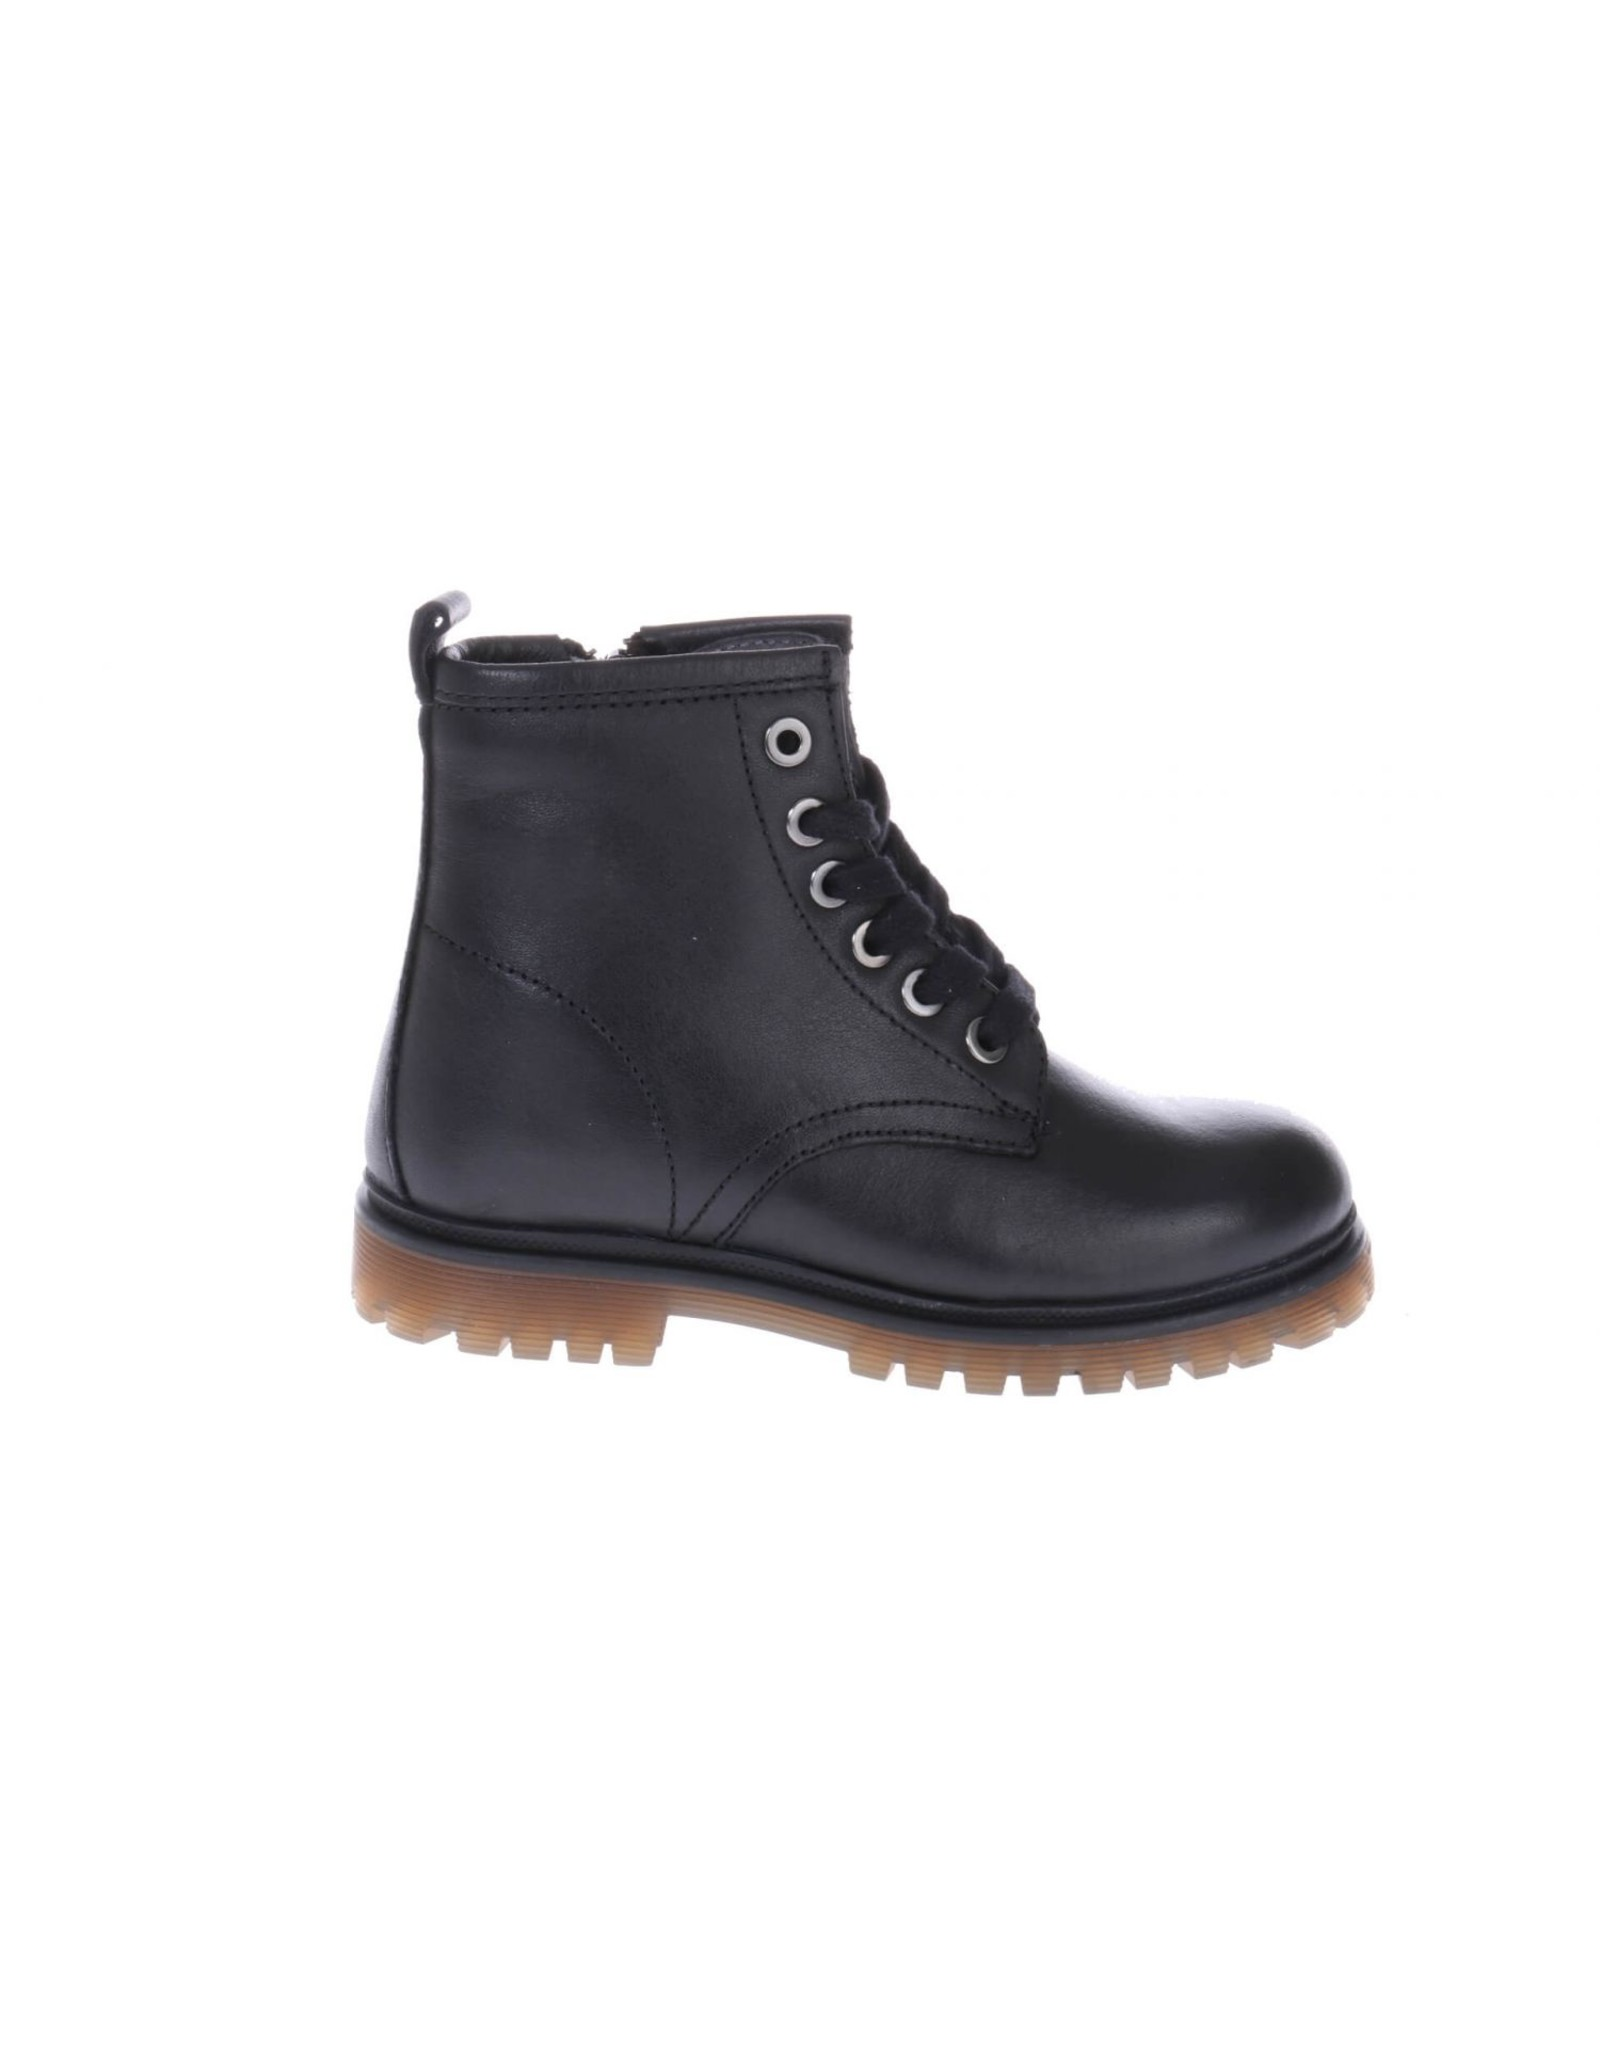 Gattino Gattino - Kinderschoen Boot Black Combi